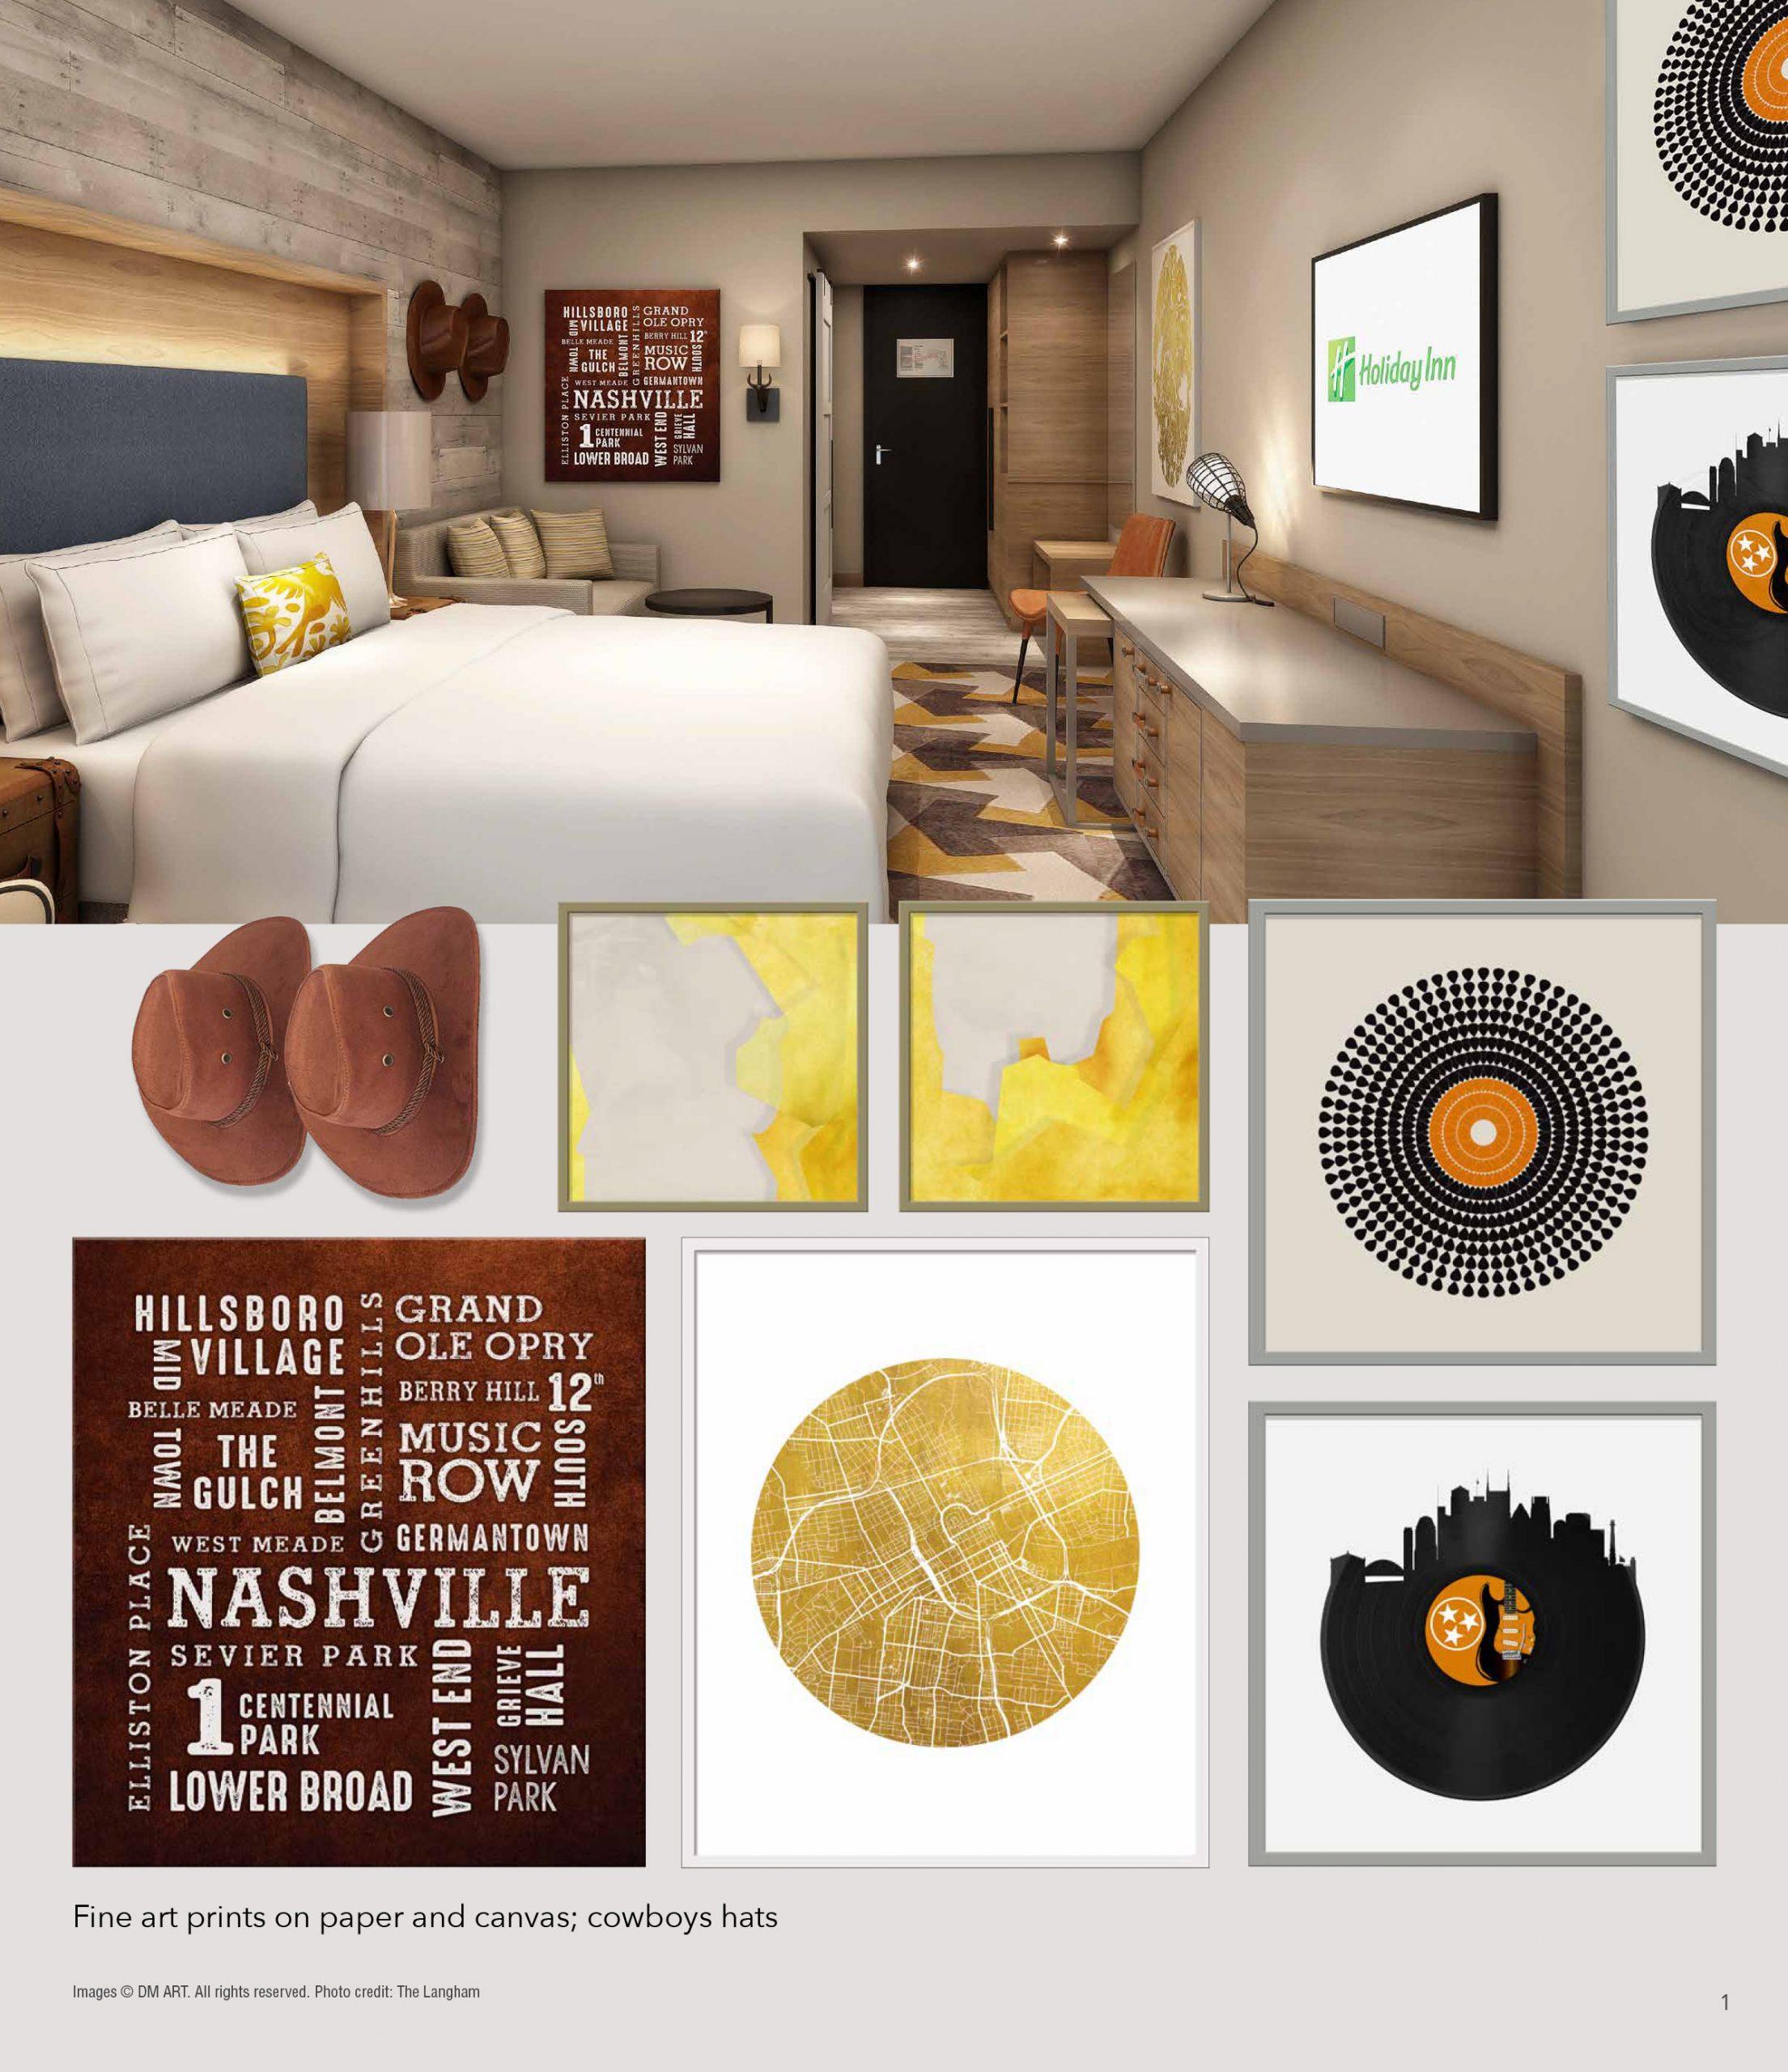 Nashville Holiday Inn